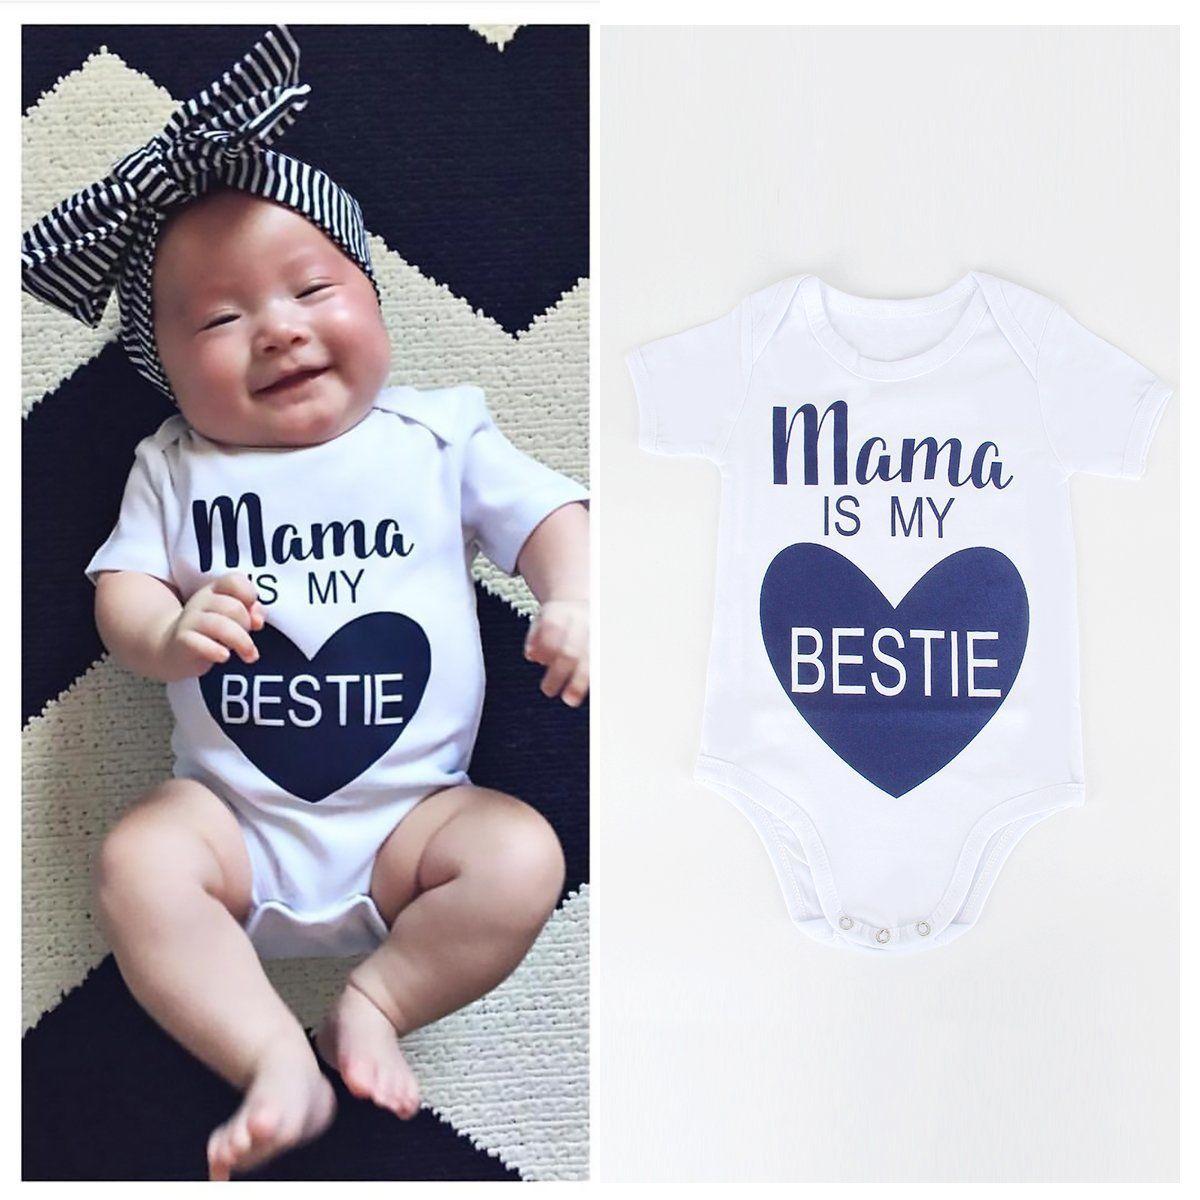 c512a0143f9  2.99 - Newborn Infant Kids Baby Boys Girls Romper Jumpsuit Bodysuit  Outfits Clothes Set  ebay  Fashion